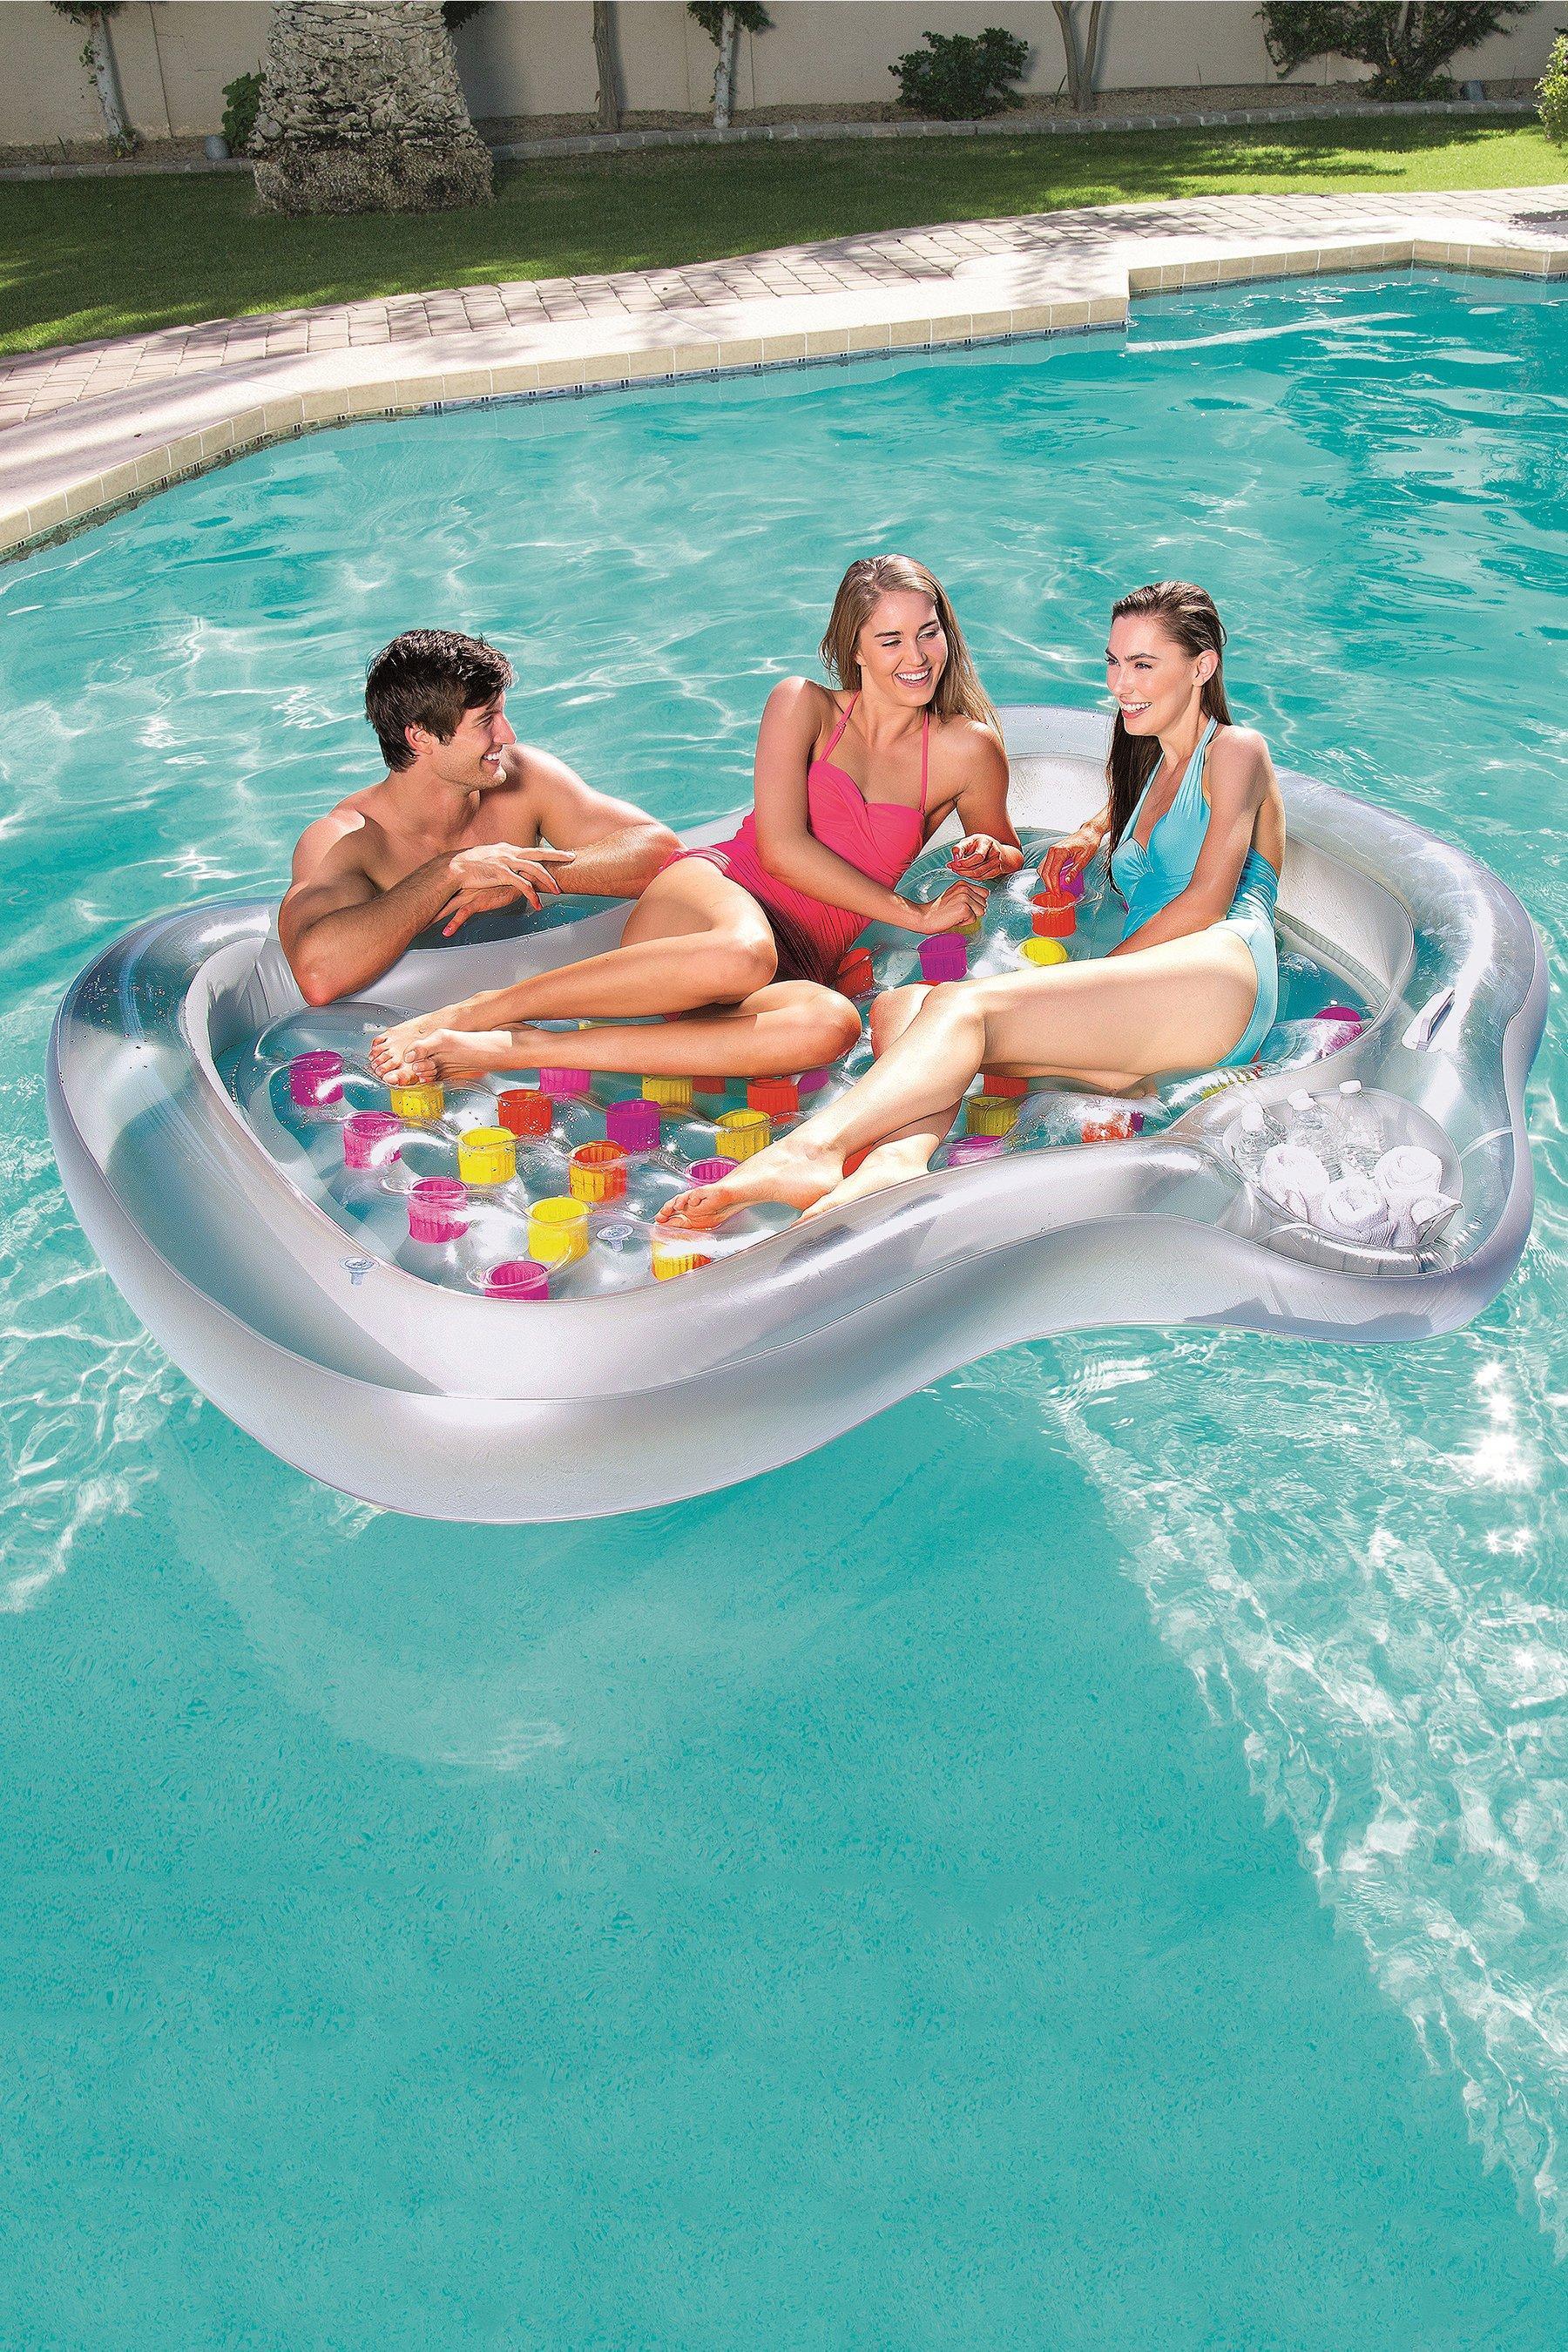 Bestway Inflatable Flocked Airbed Built